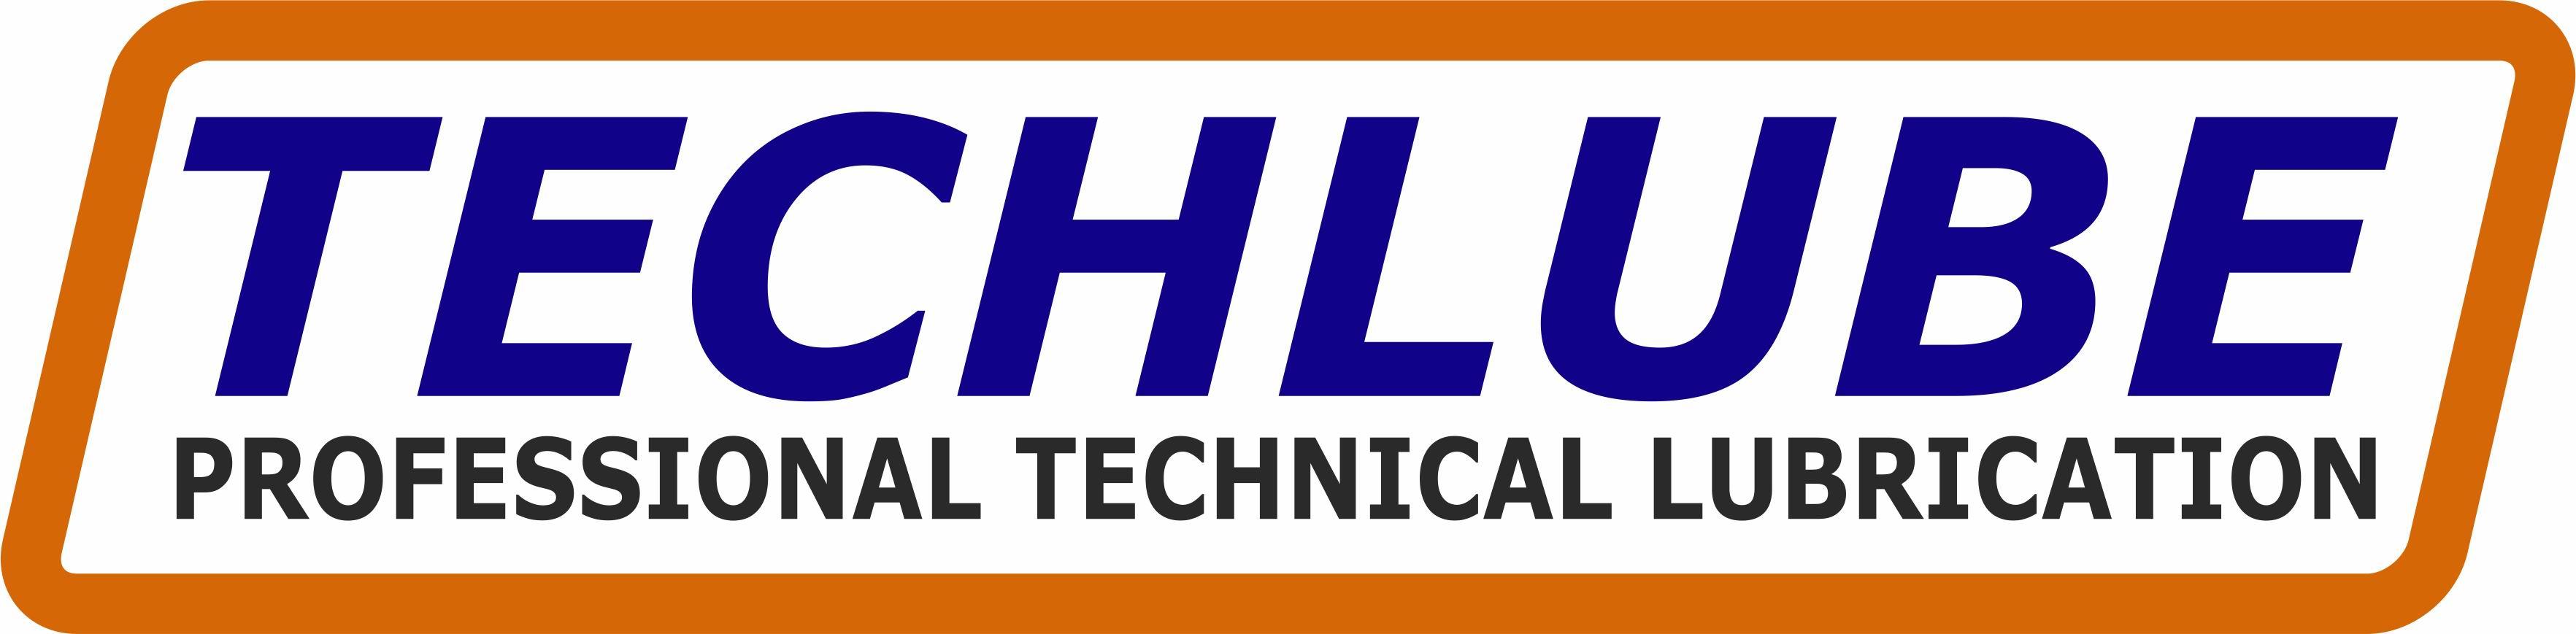 techlube-logo